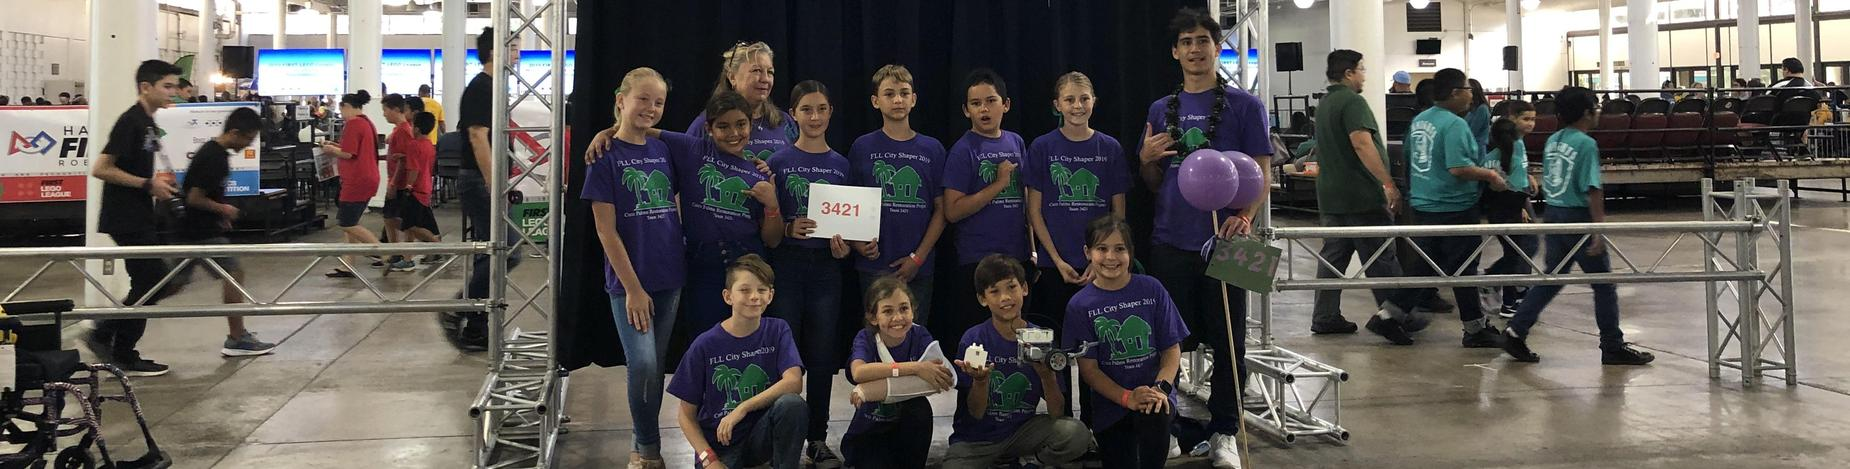 Kilauea Robotics Kids Team 3421!